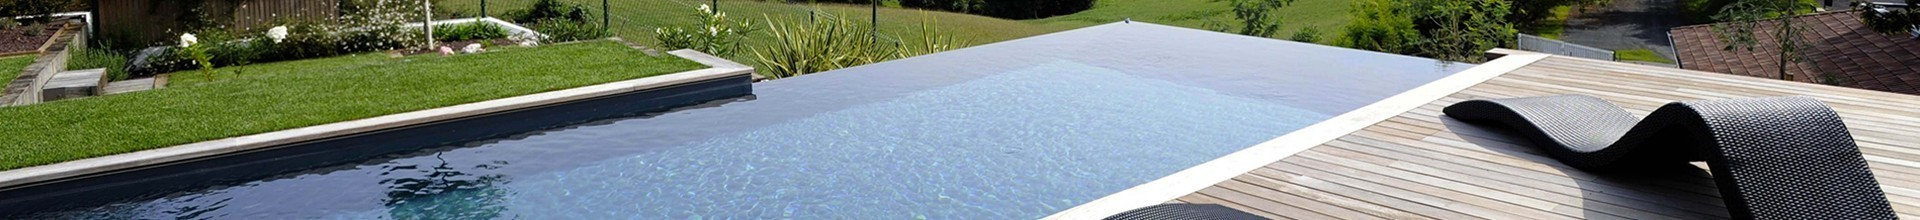 Normandie Calvados plans de montage d'une piscine en béton, robuste